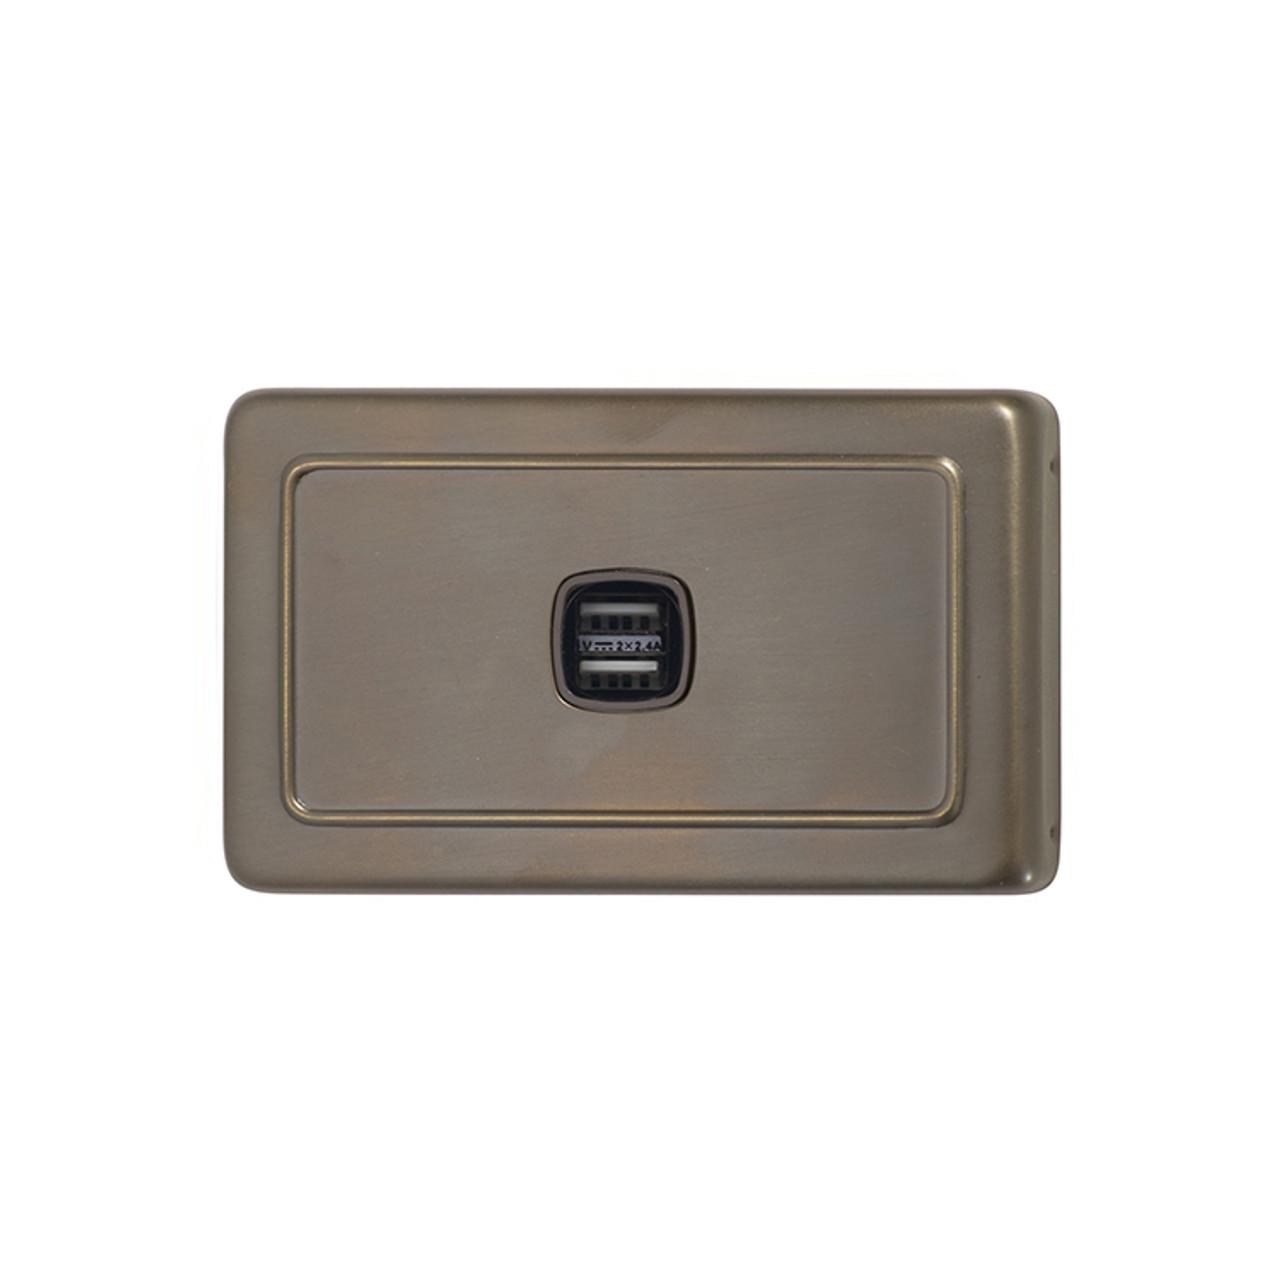 Antique Brass USB Outlet Horizontal Aspect